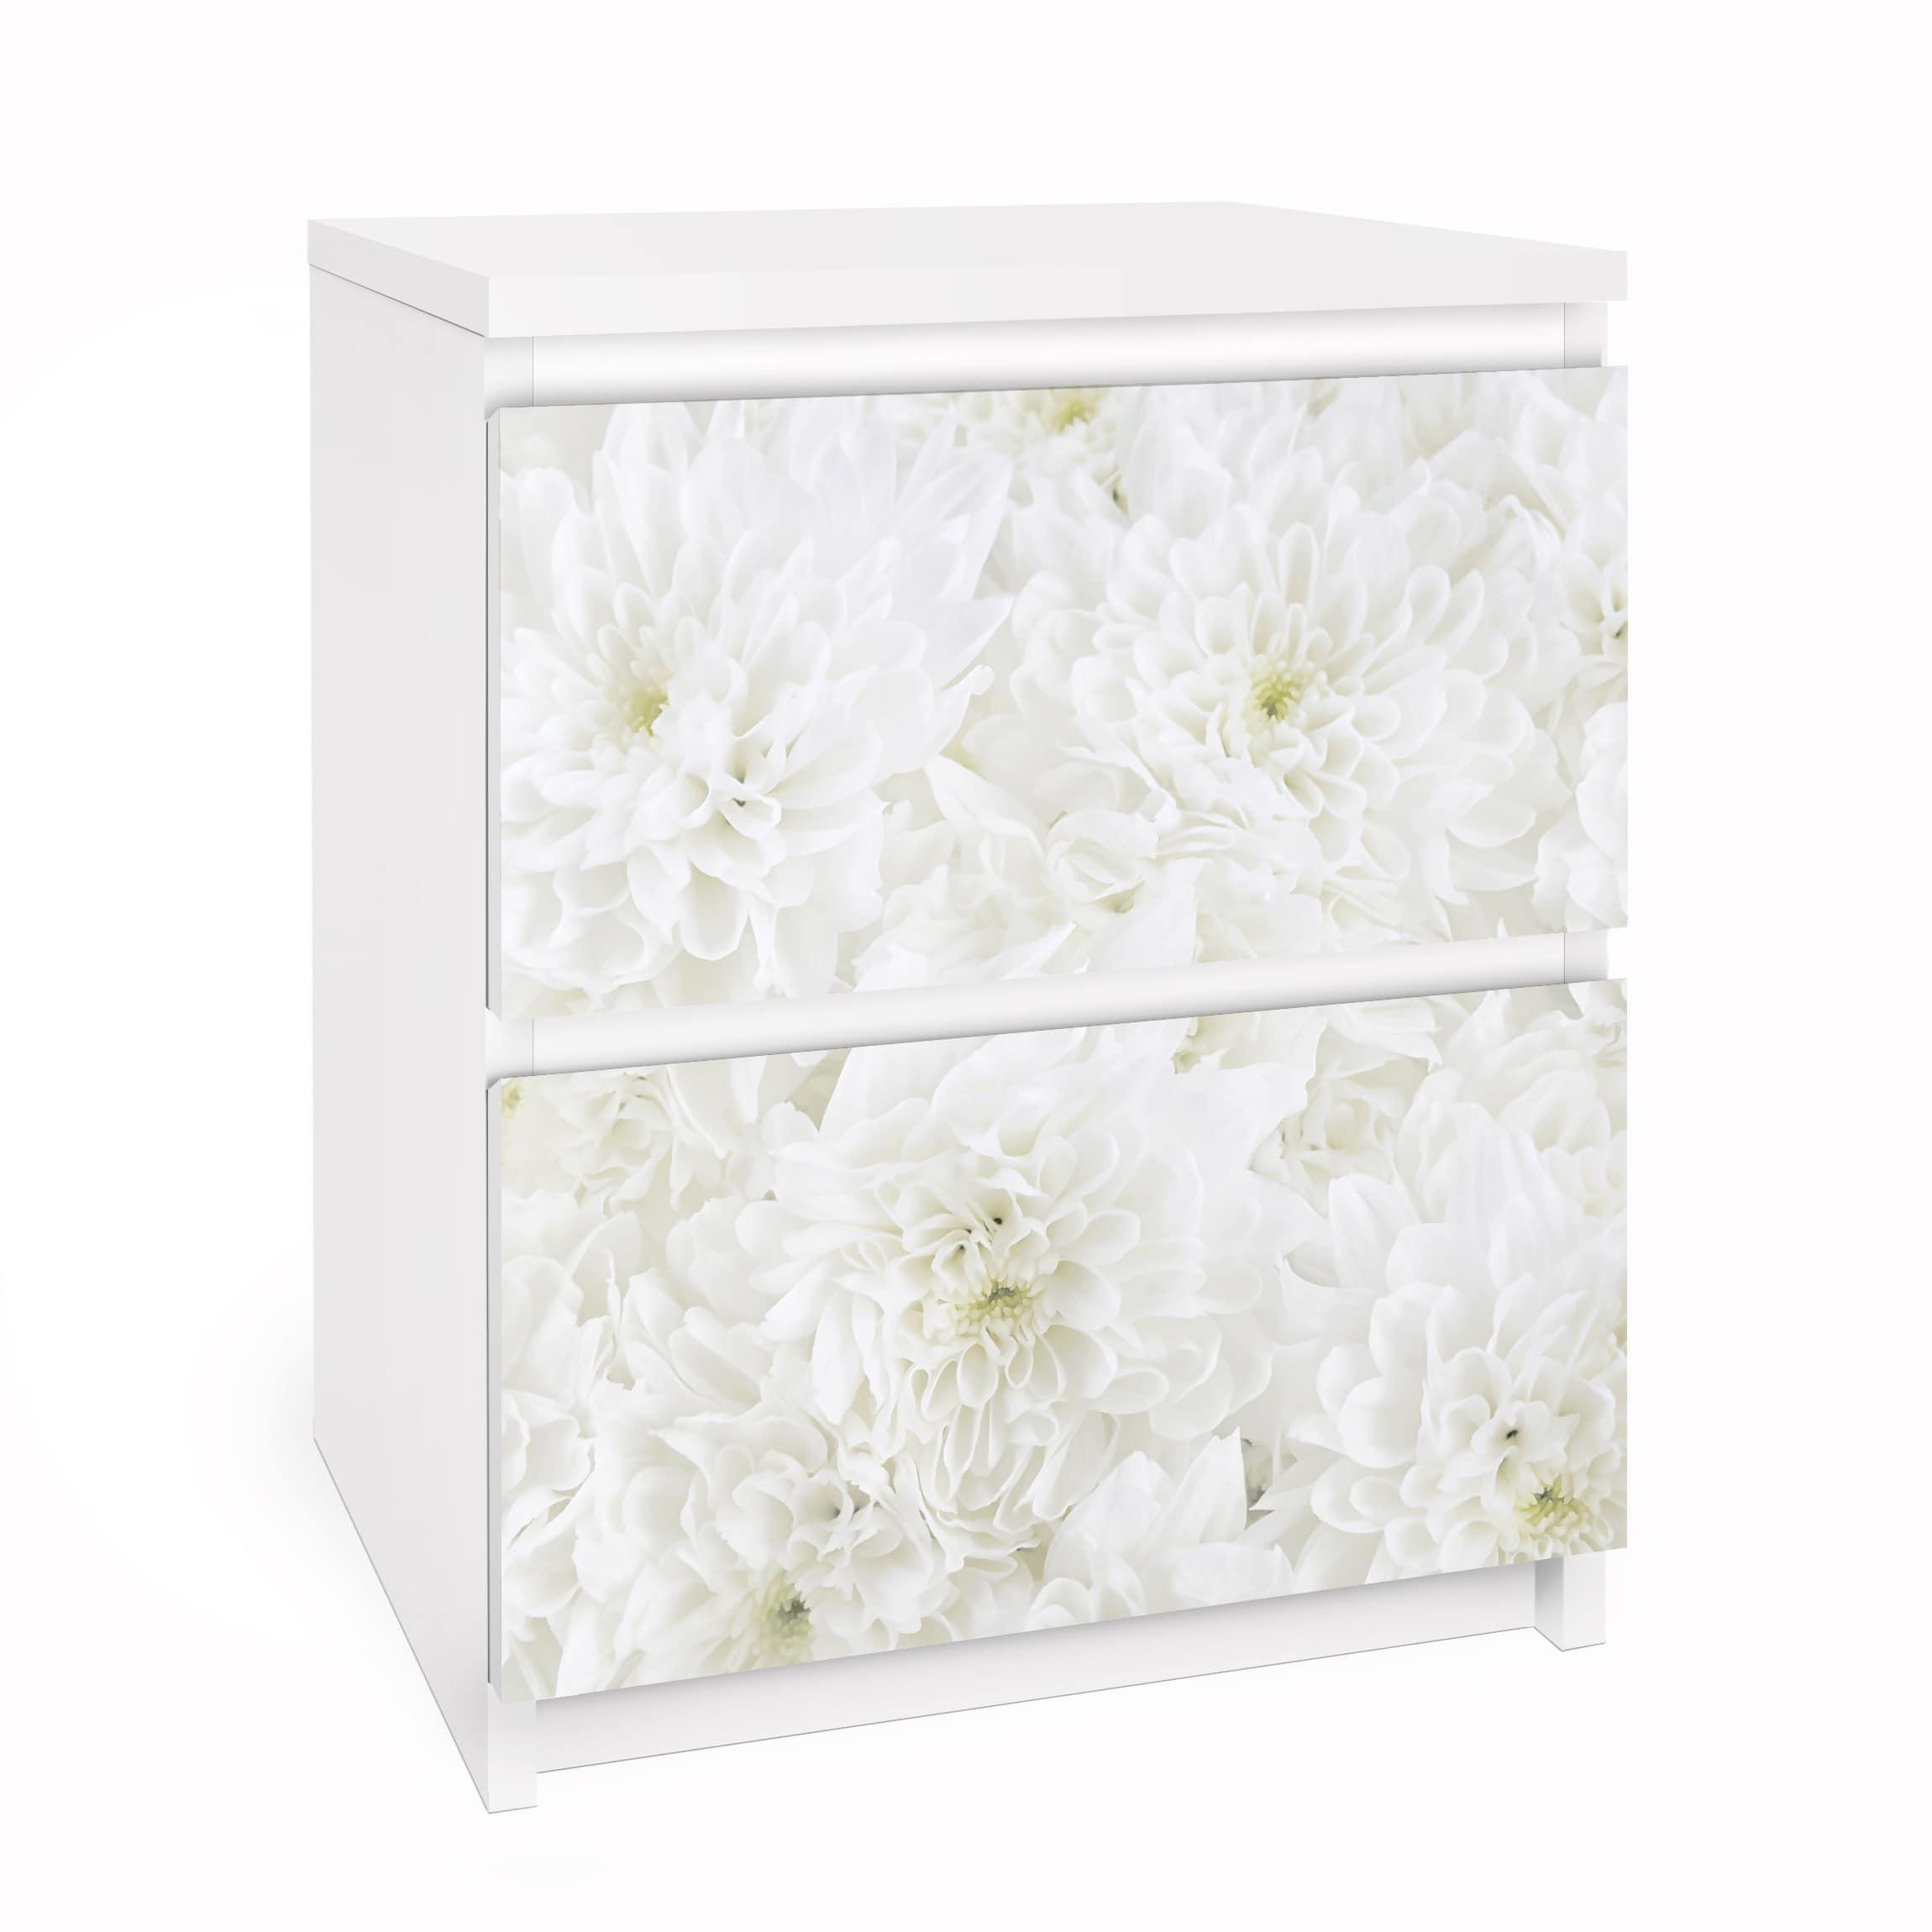 Furniture Decal For Ikea Malm Dresser 2xdrawers Dahlias Flower Sea White